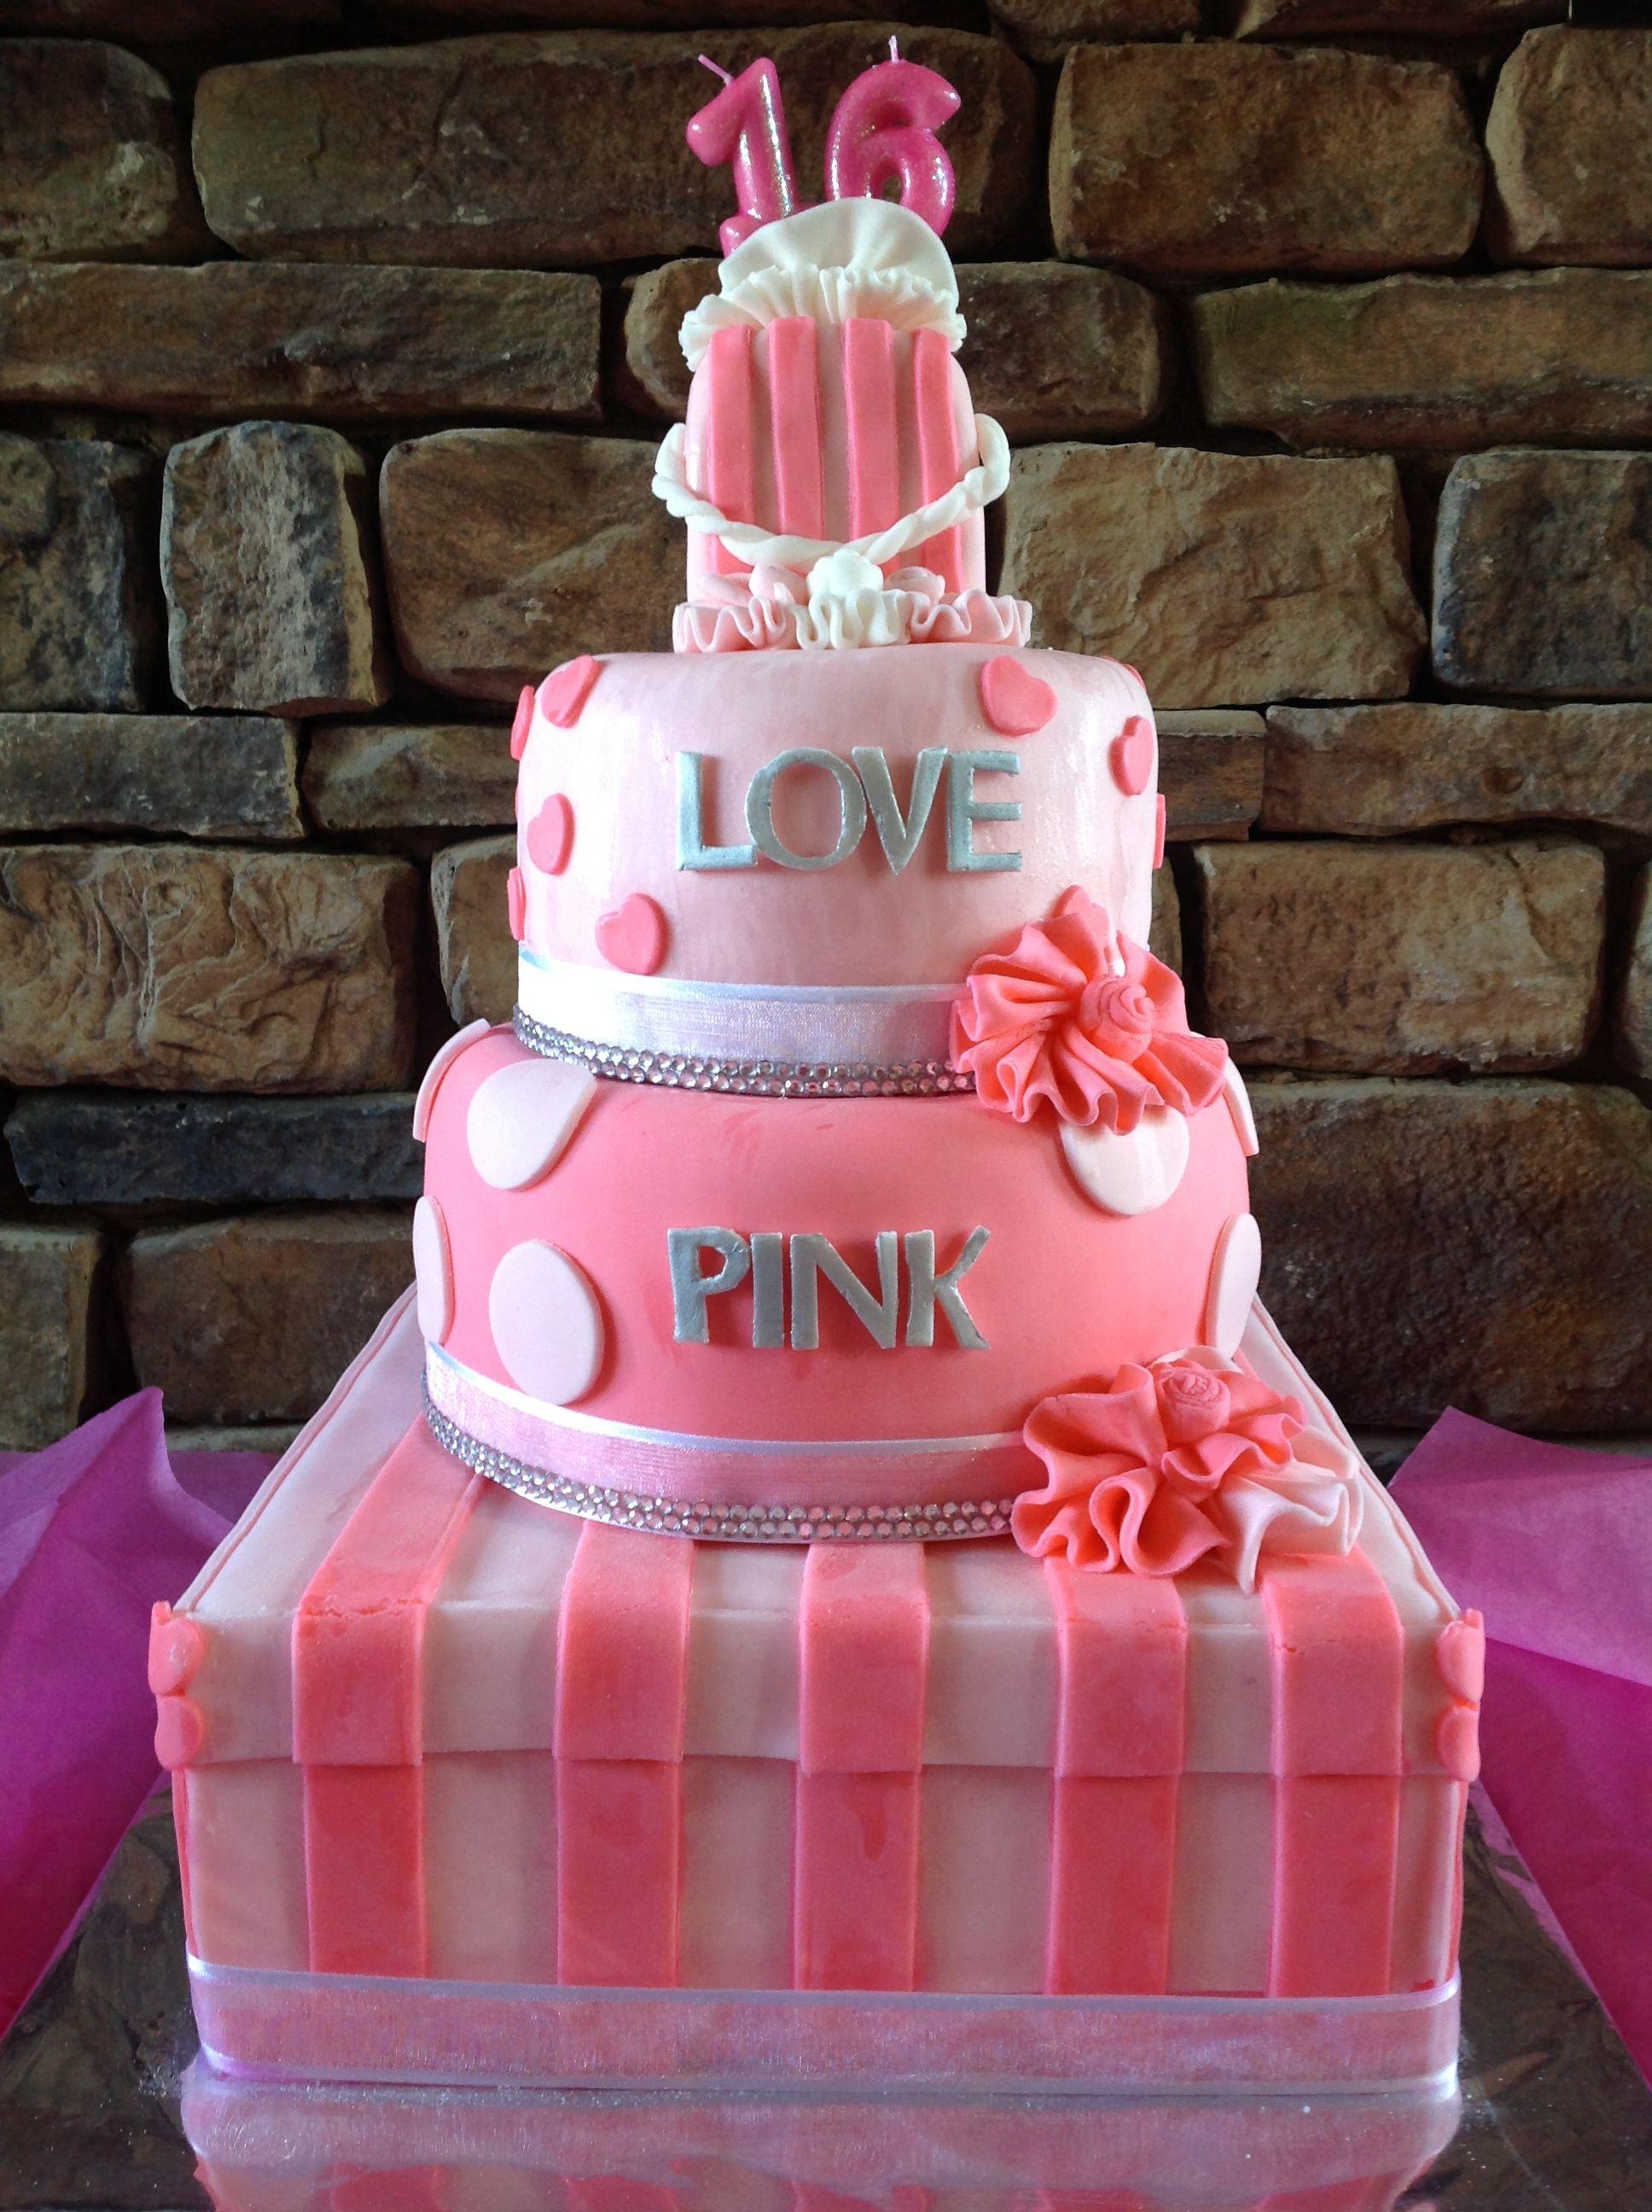 victoria secret pink cake decorations